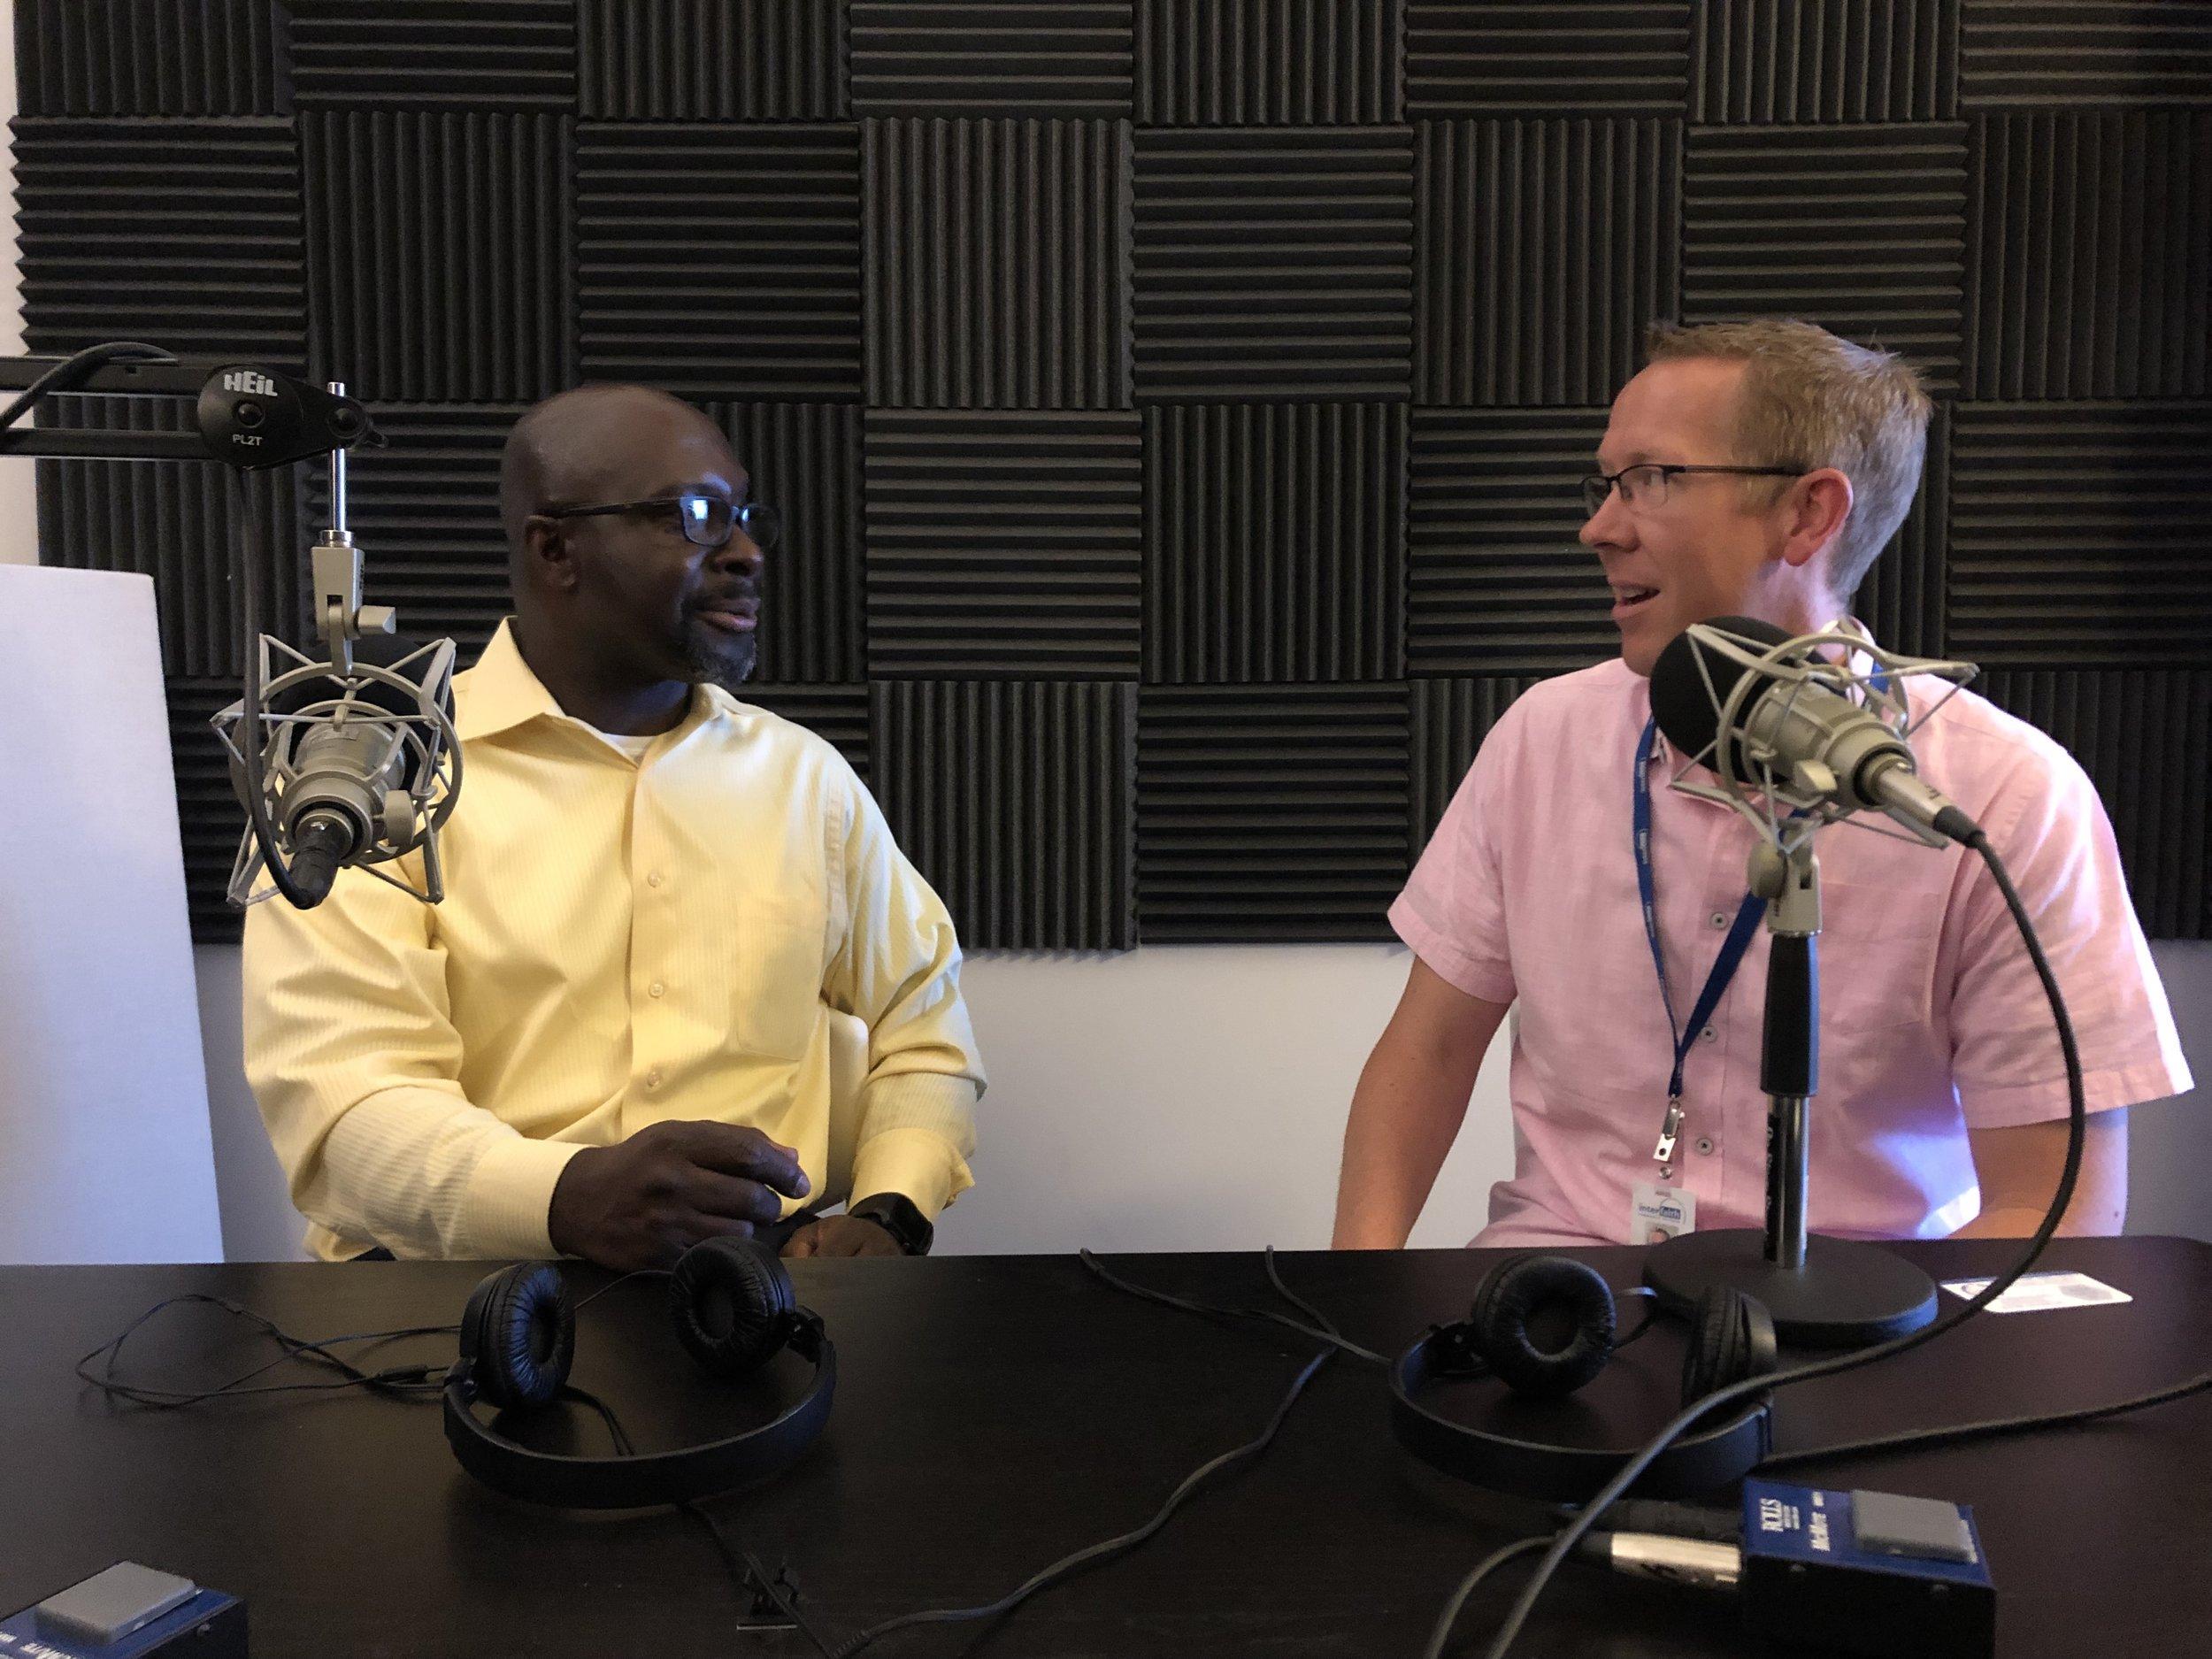 Marlon and Greg in the studio